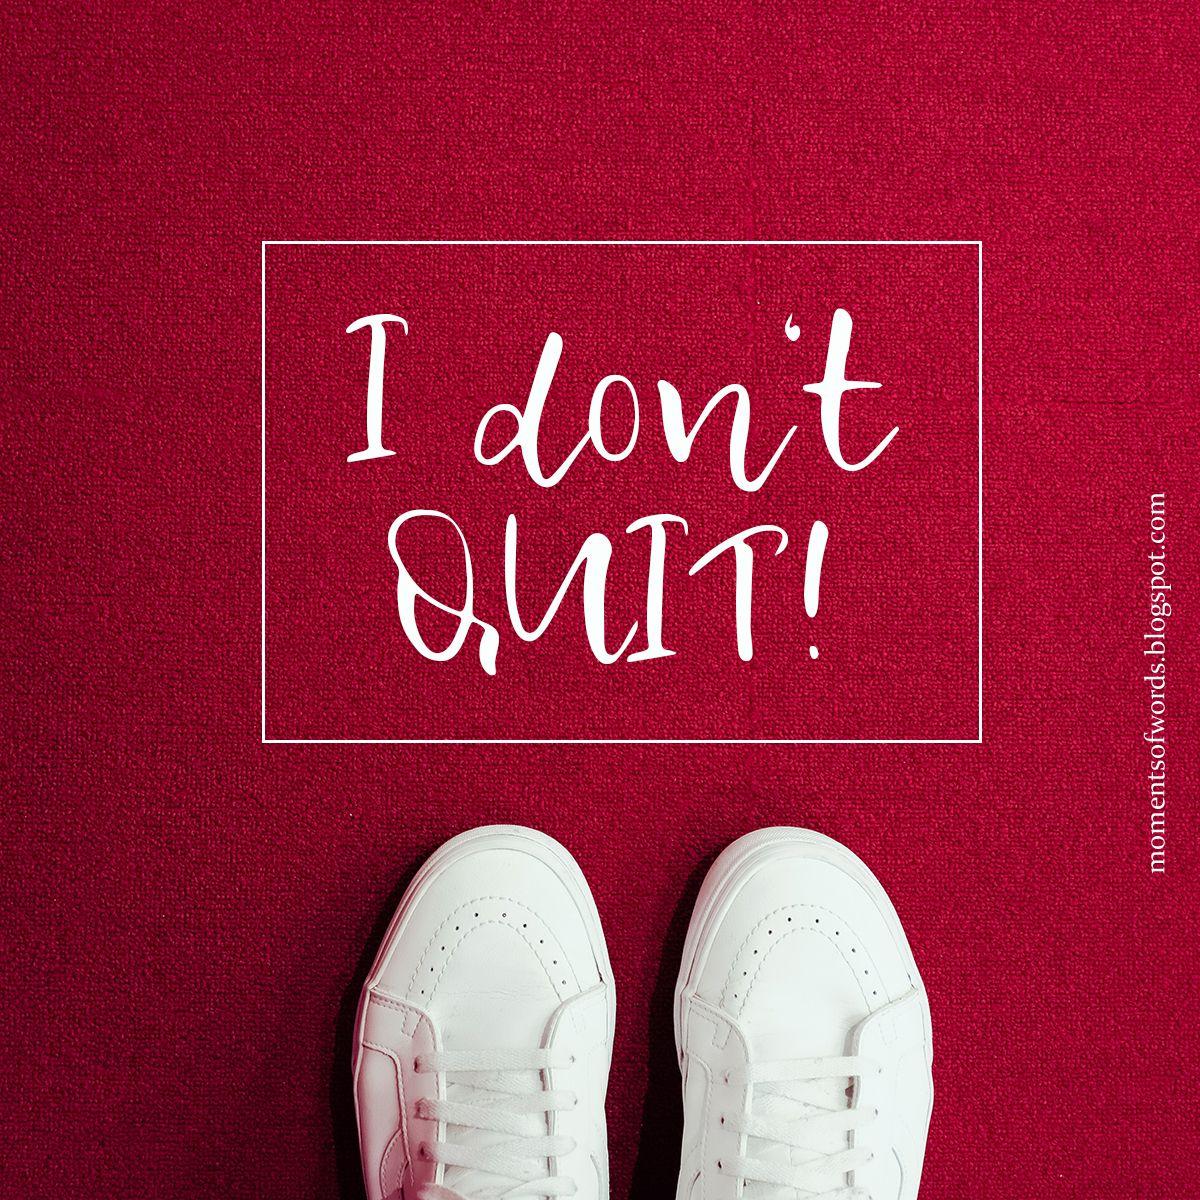 Don't Give Up! #mondaymotivation